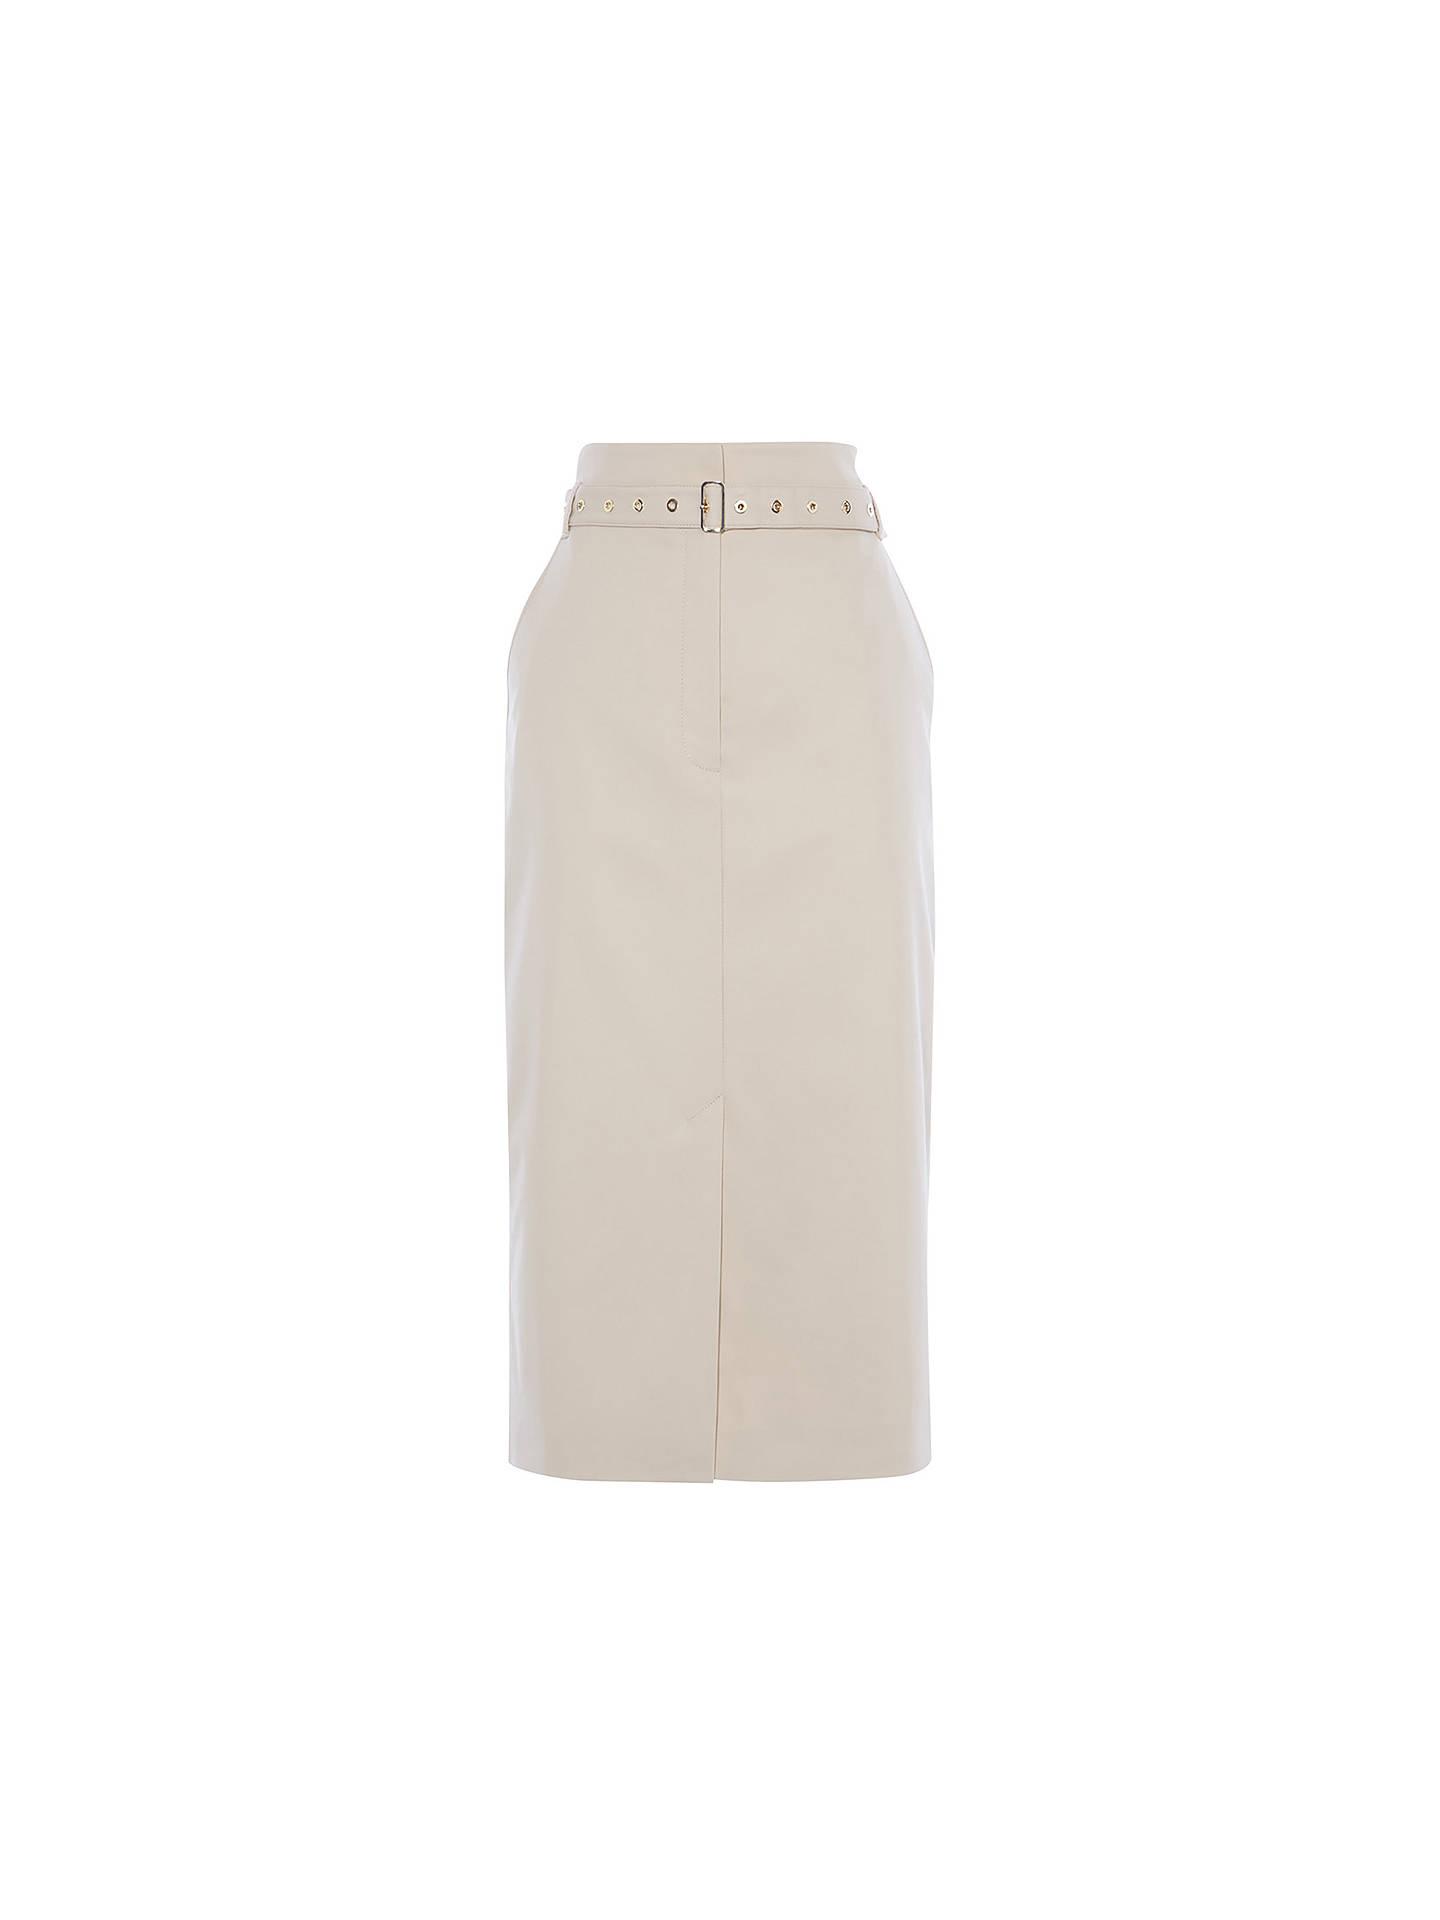 New KAREN MILLEN Stone BNWT £125 SD026 Belted Utility Skirt UK Size 10 12 14 16